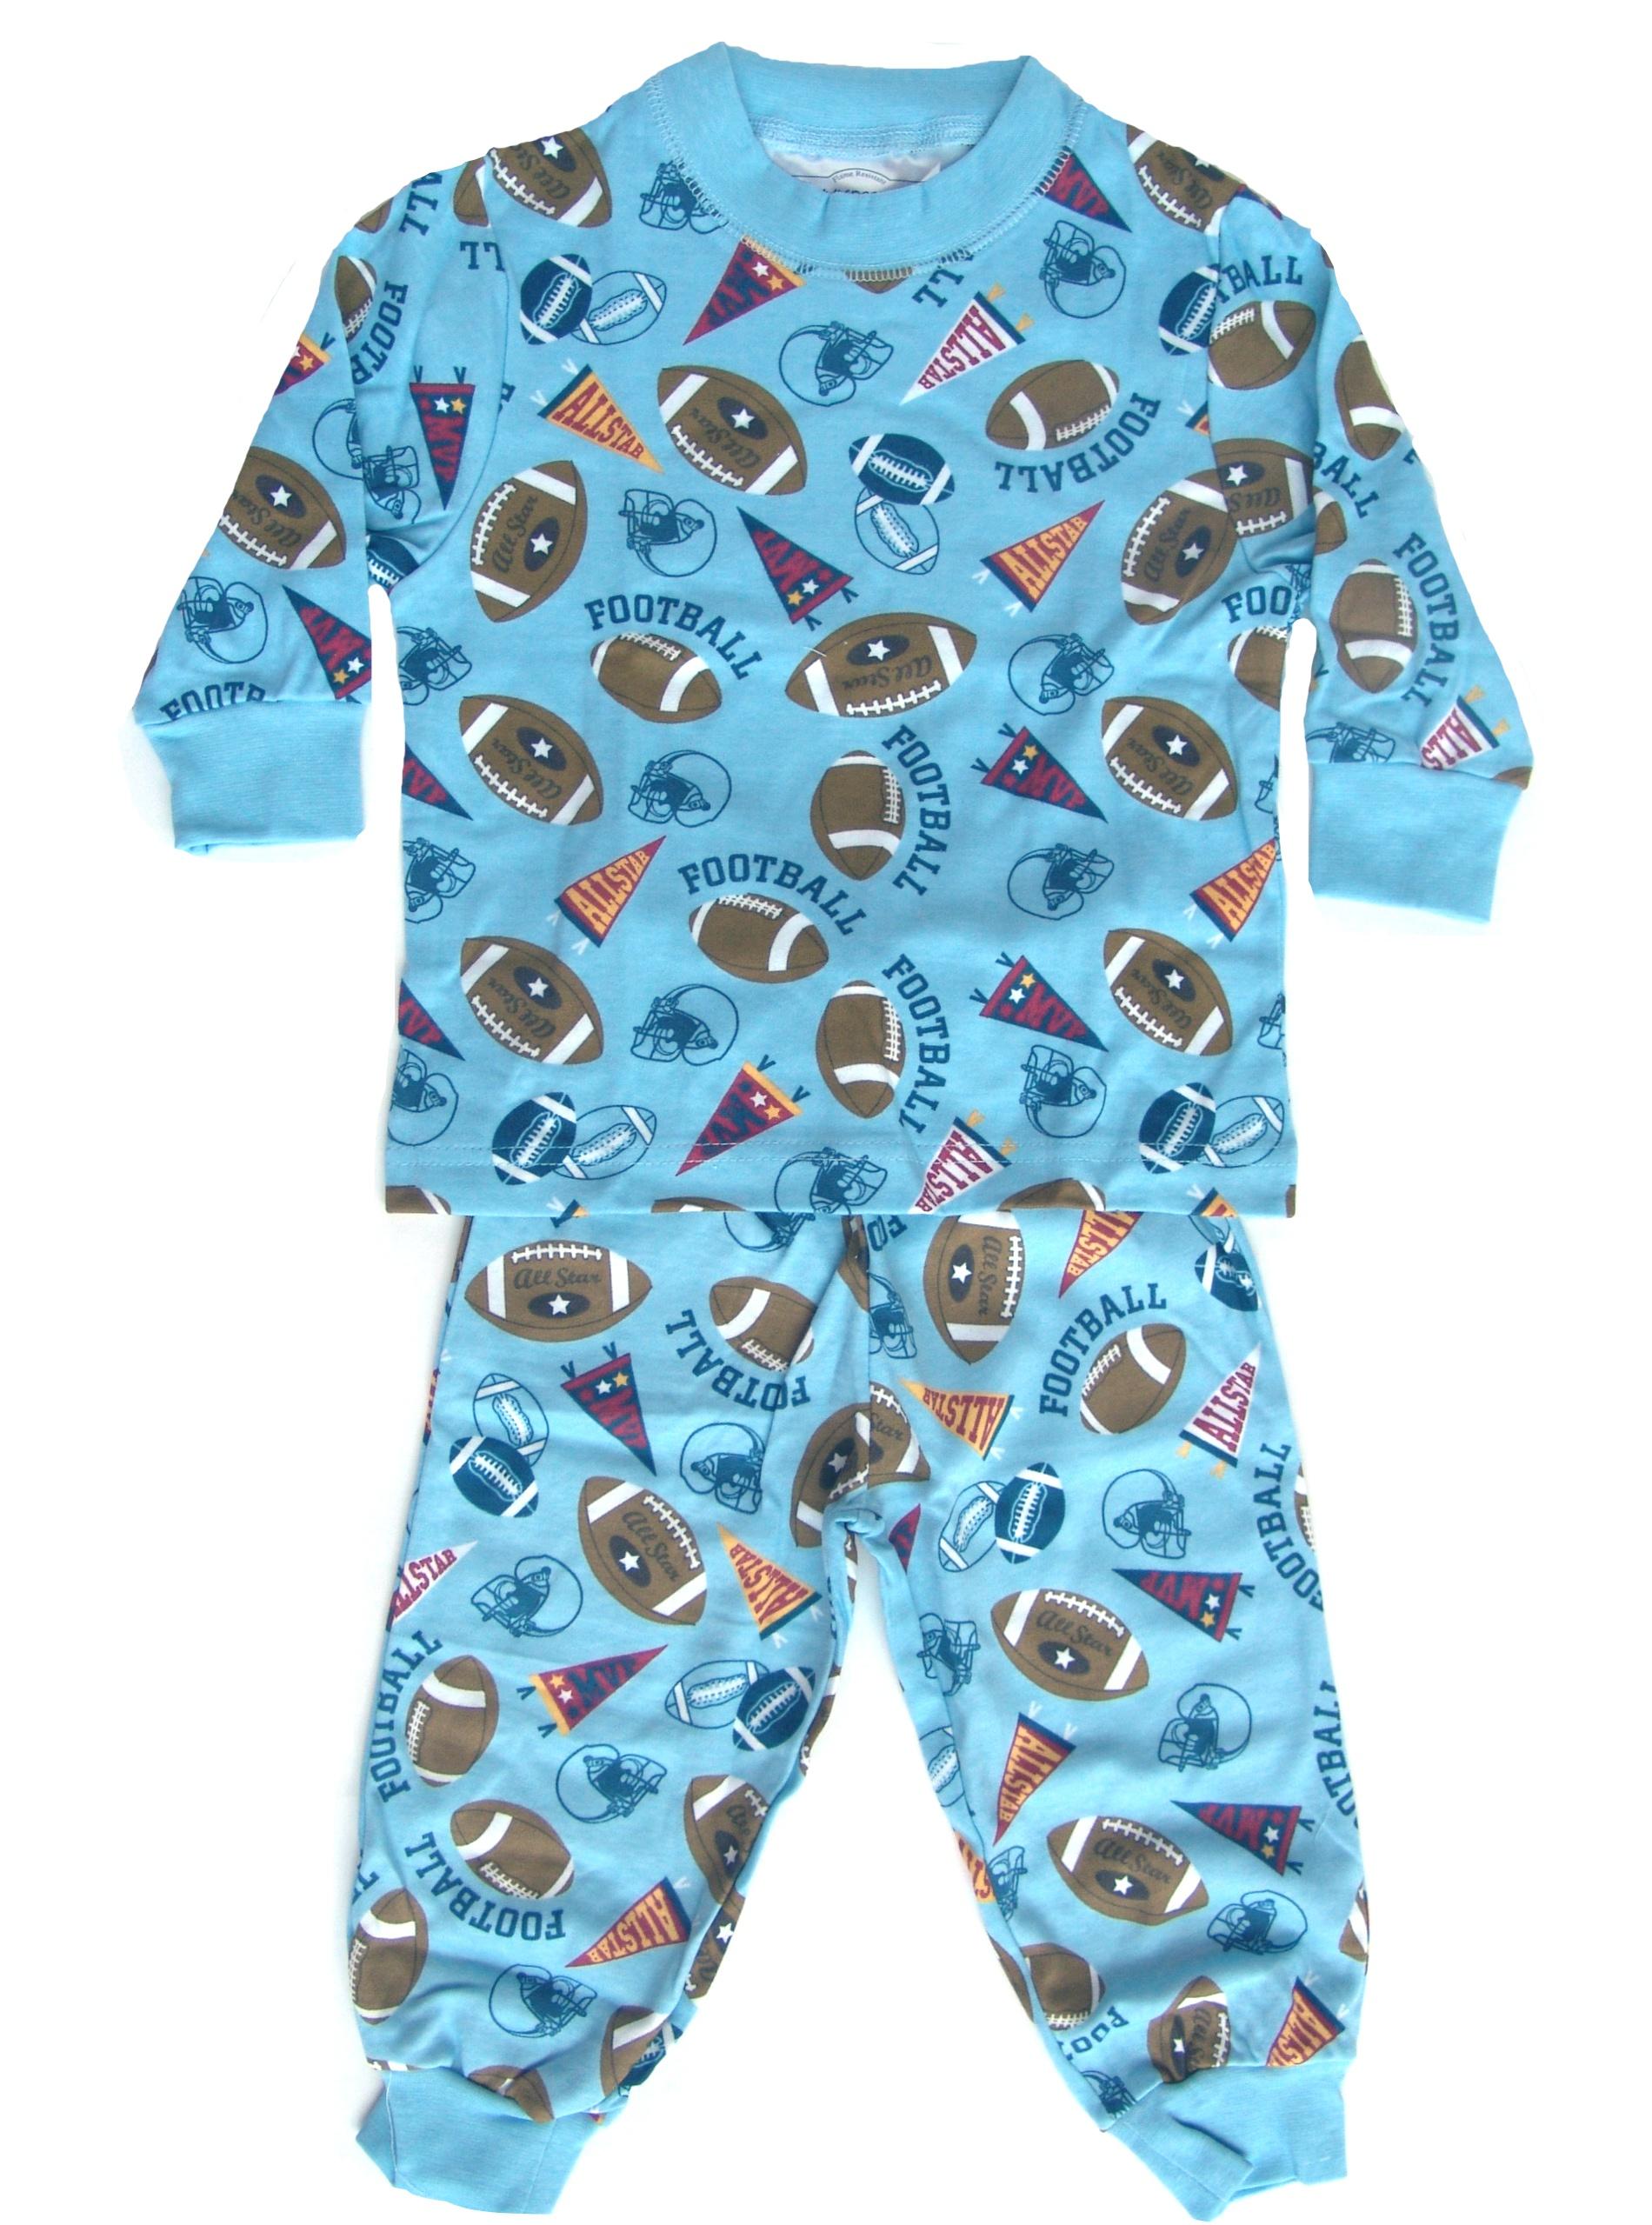 Best pajama clip art. Pajamas clipart boy